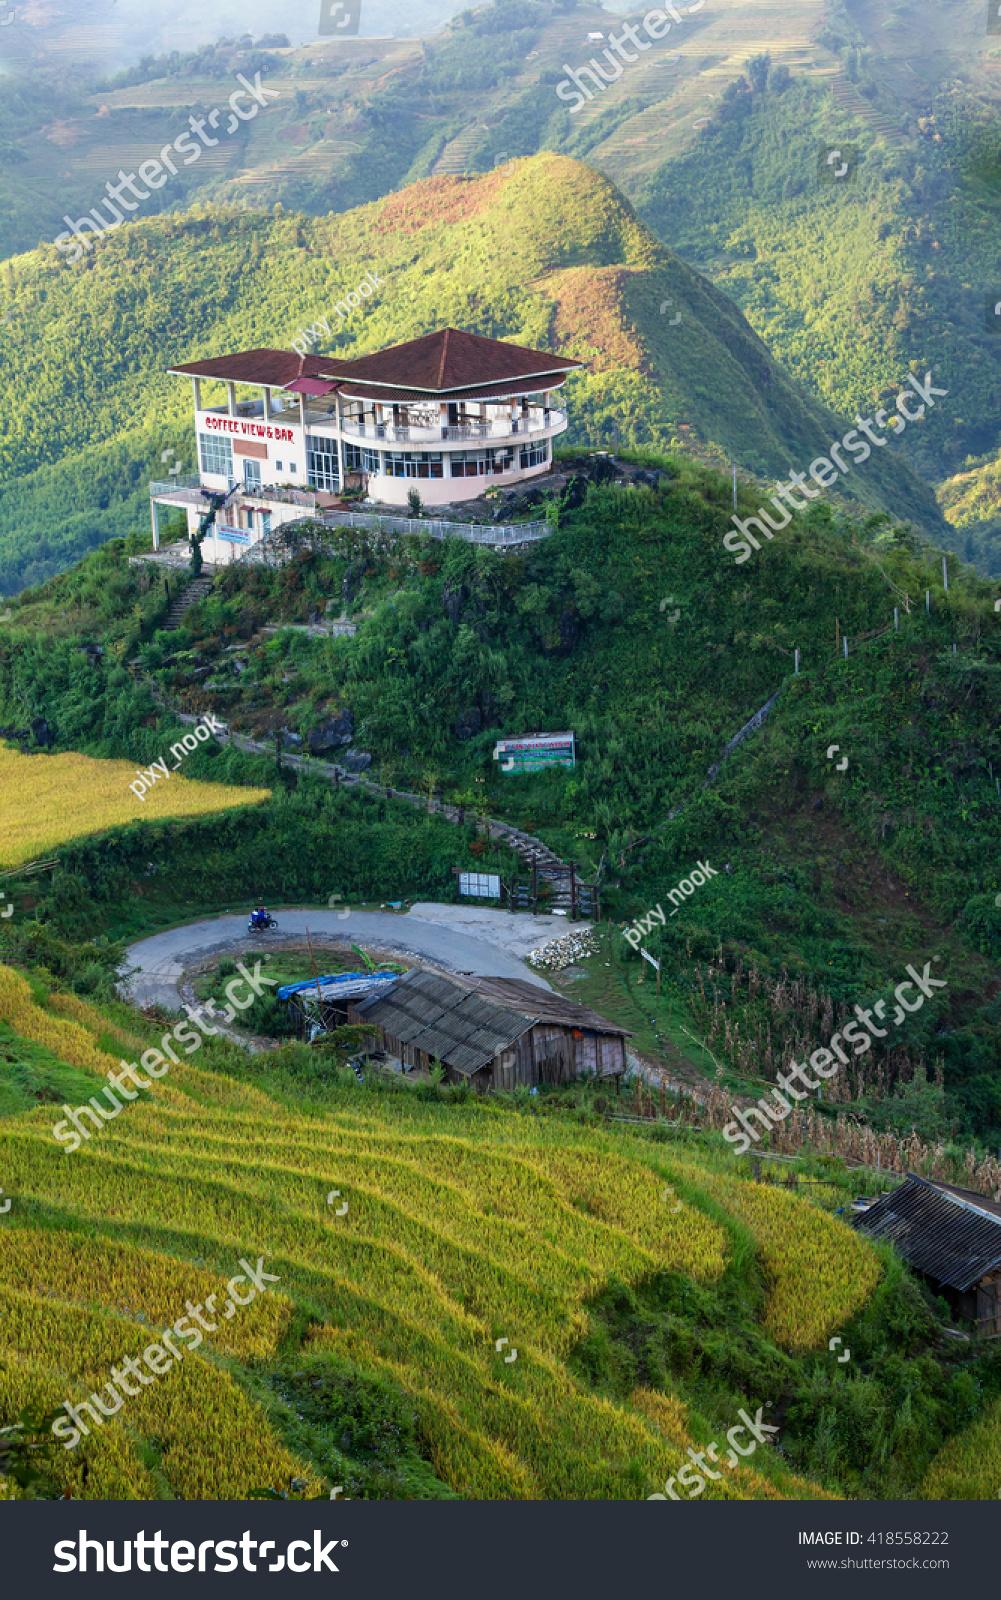 Beautiful landscape vietnam gallery diagram writing sample and guide sapa vietnam jan 2016 coffee shop stock photo 418558222 shutterstock sapa vietnam jan 2016 the coffee sciox Choice Image